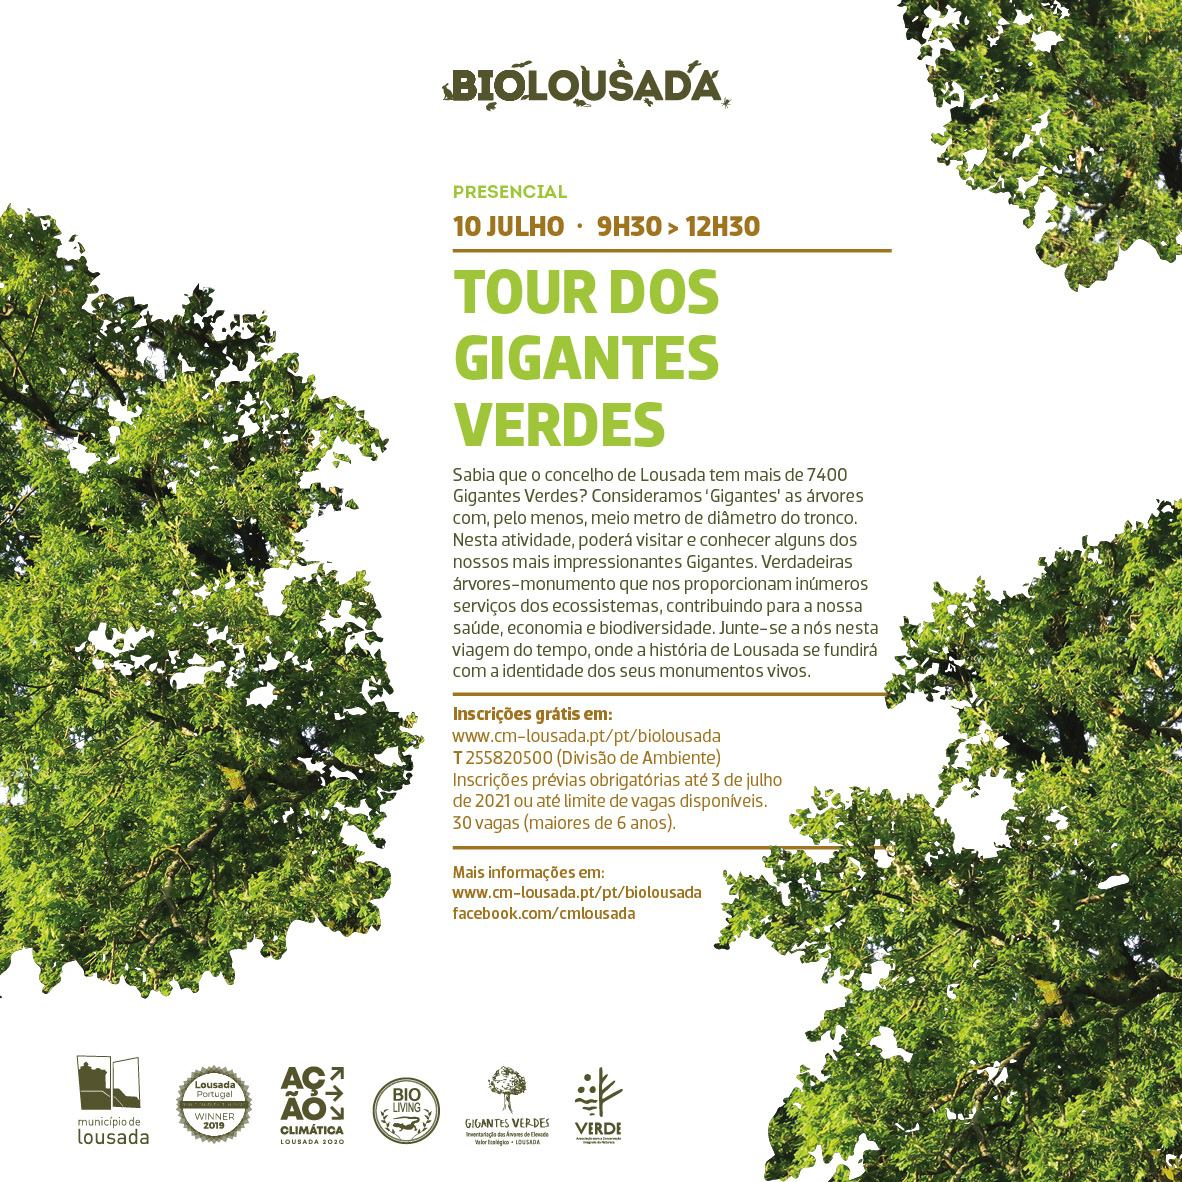 BioLousada - Tour dos Gigantes Verdes